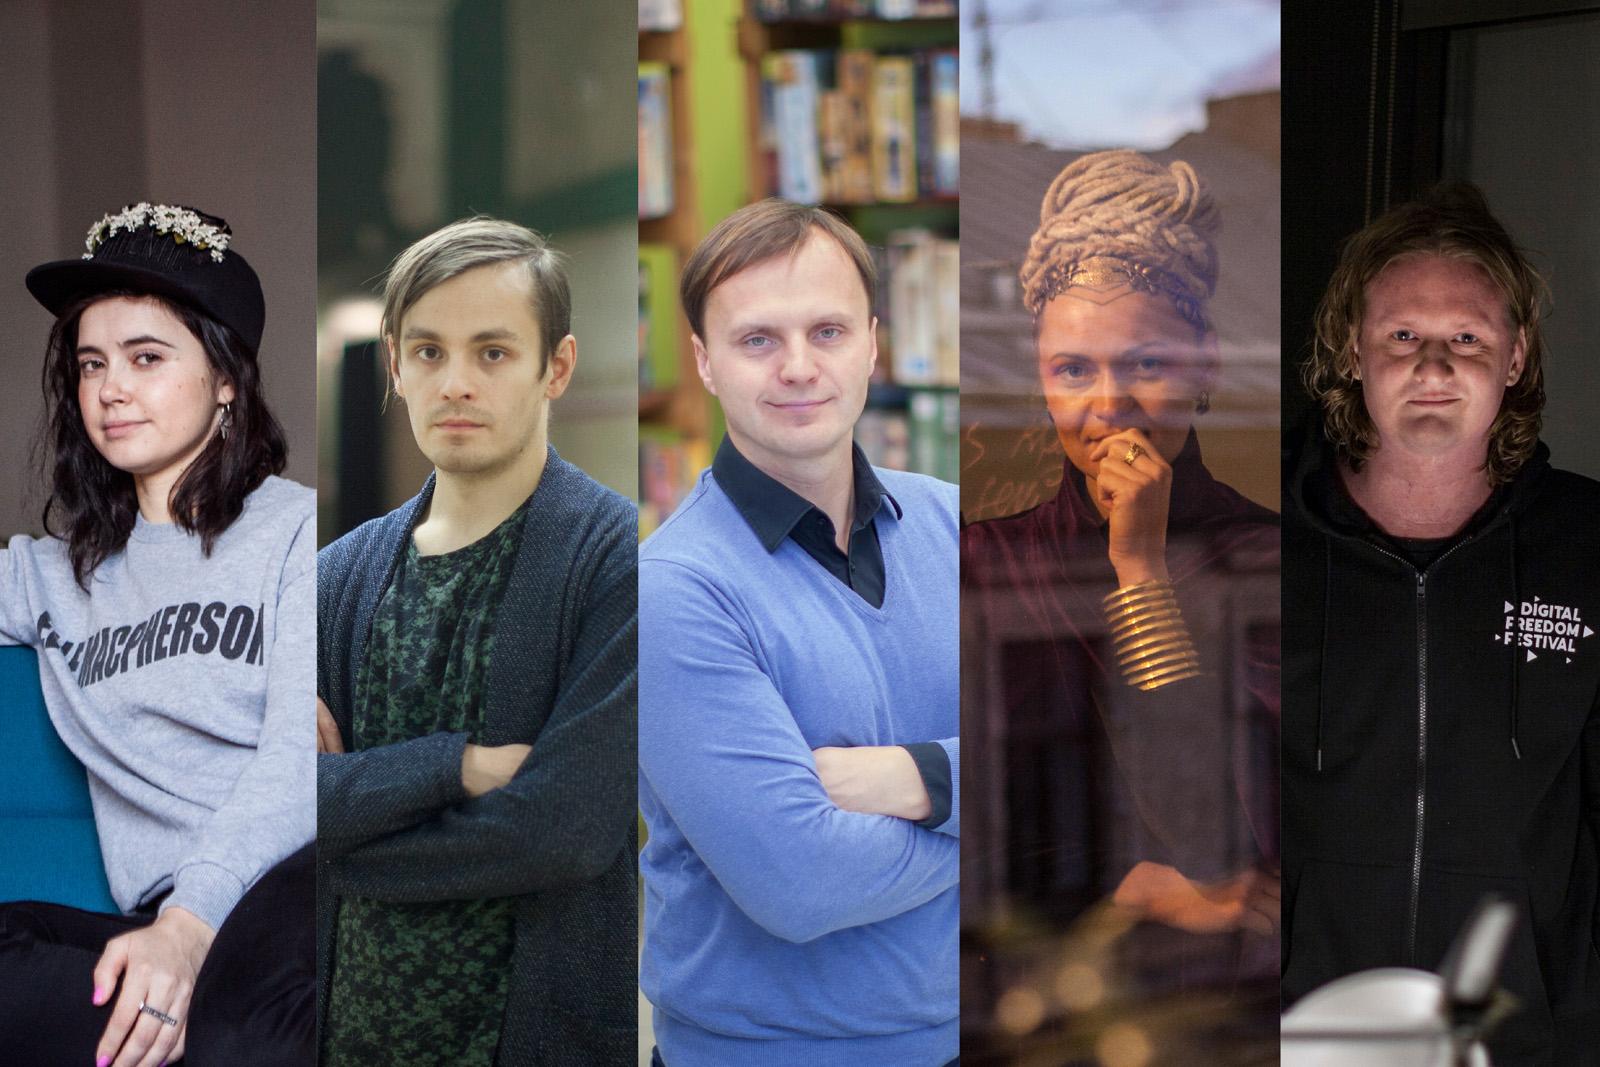 L-R: Agnese Kleina, Andrejs Strokins, Egils Grasmanis, Inin Nini, Uldis Leiterts